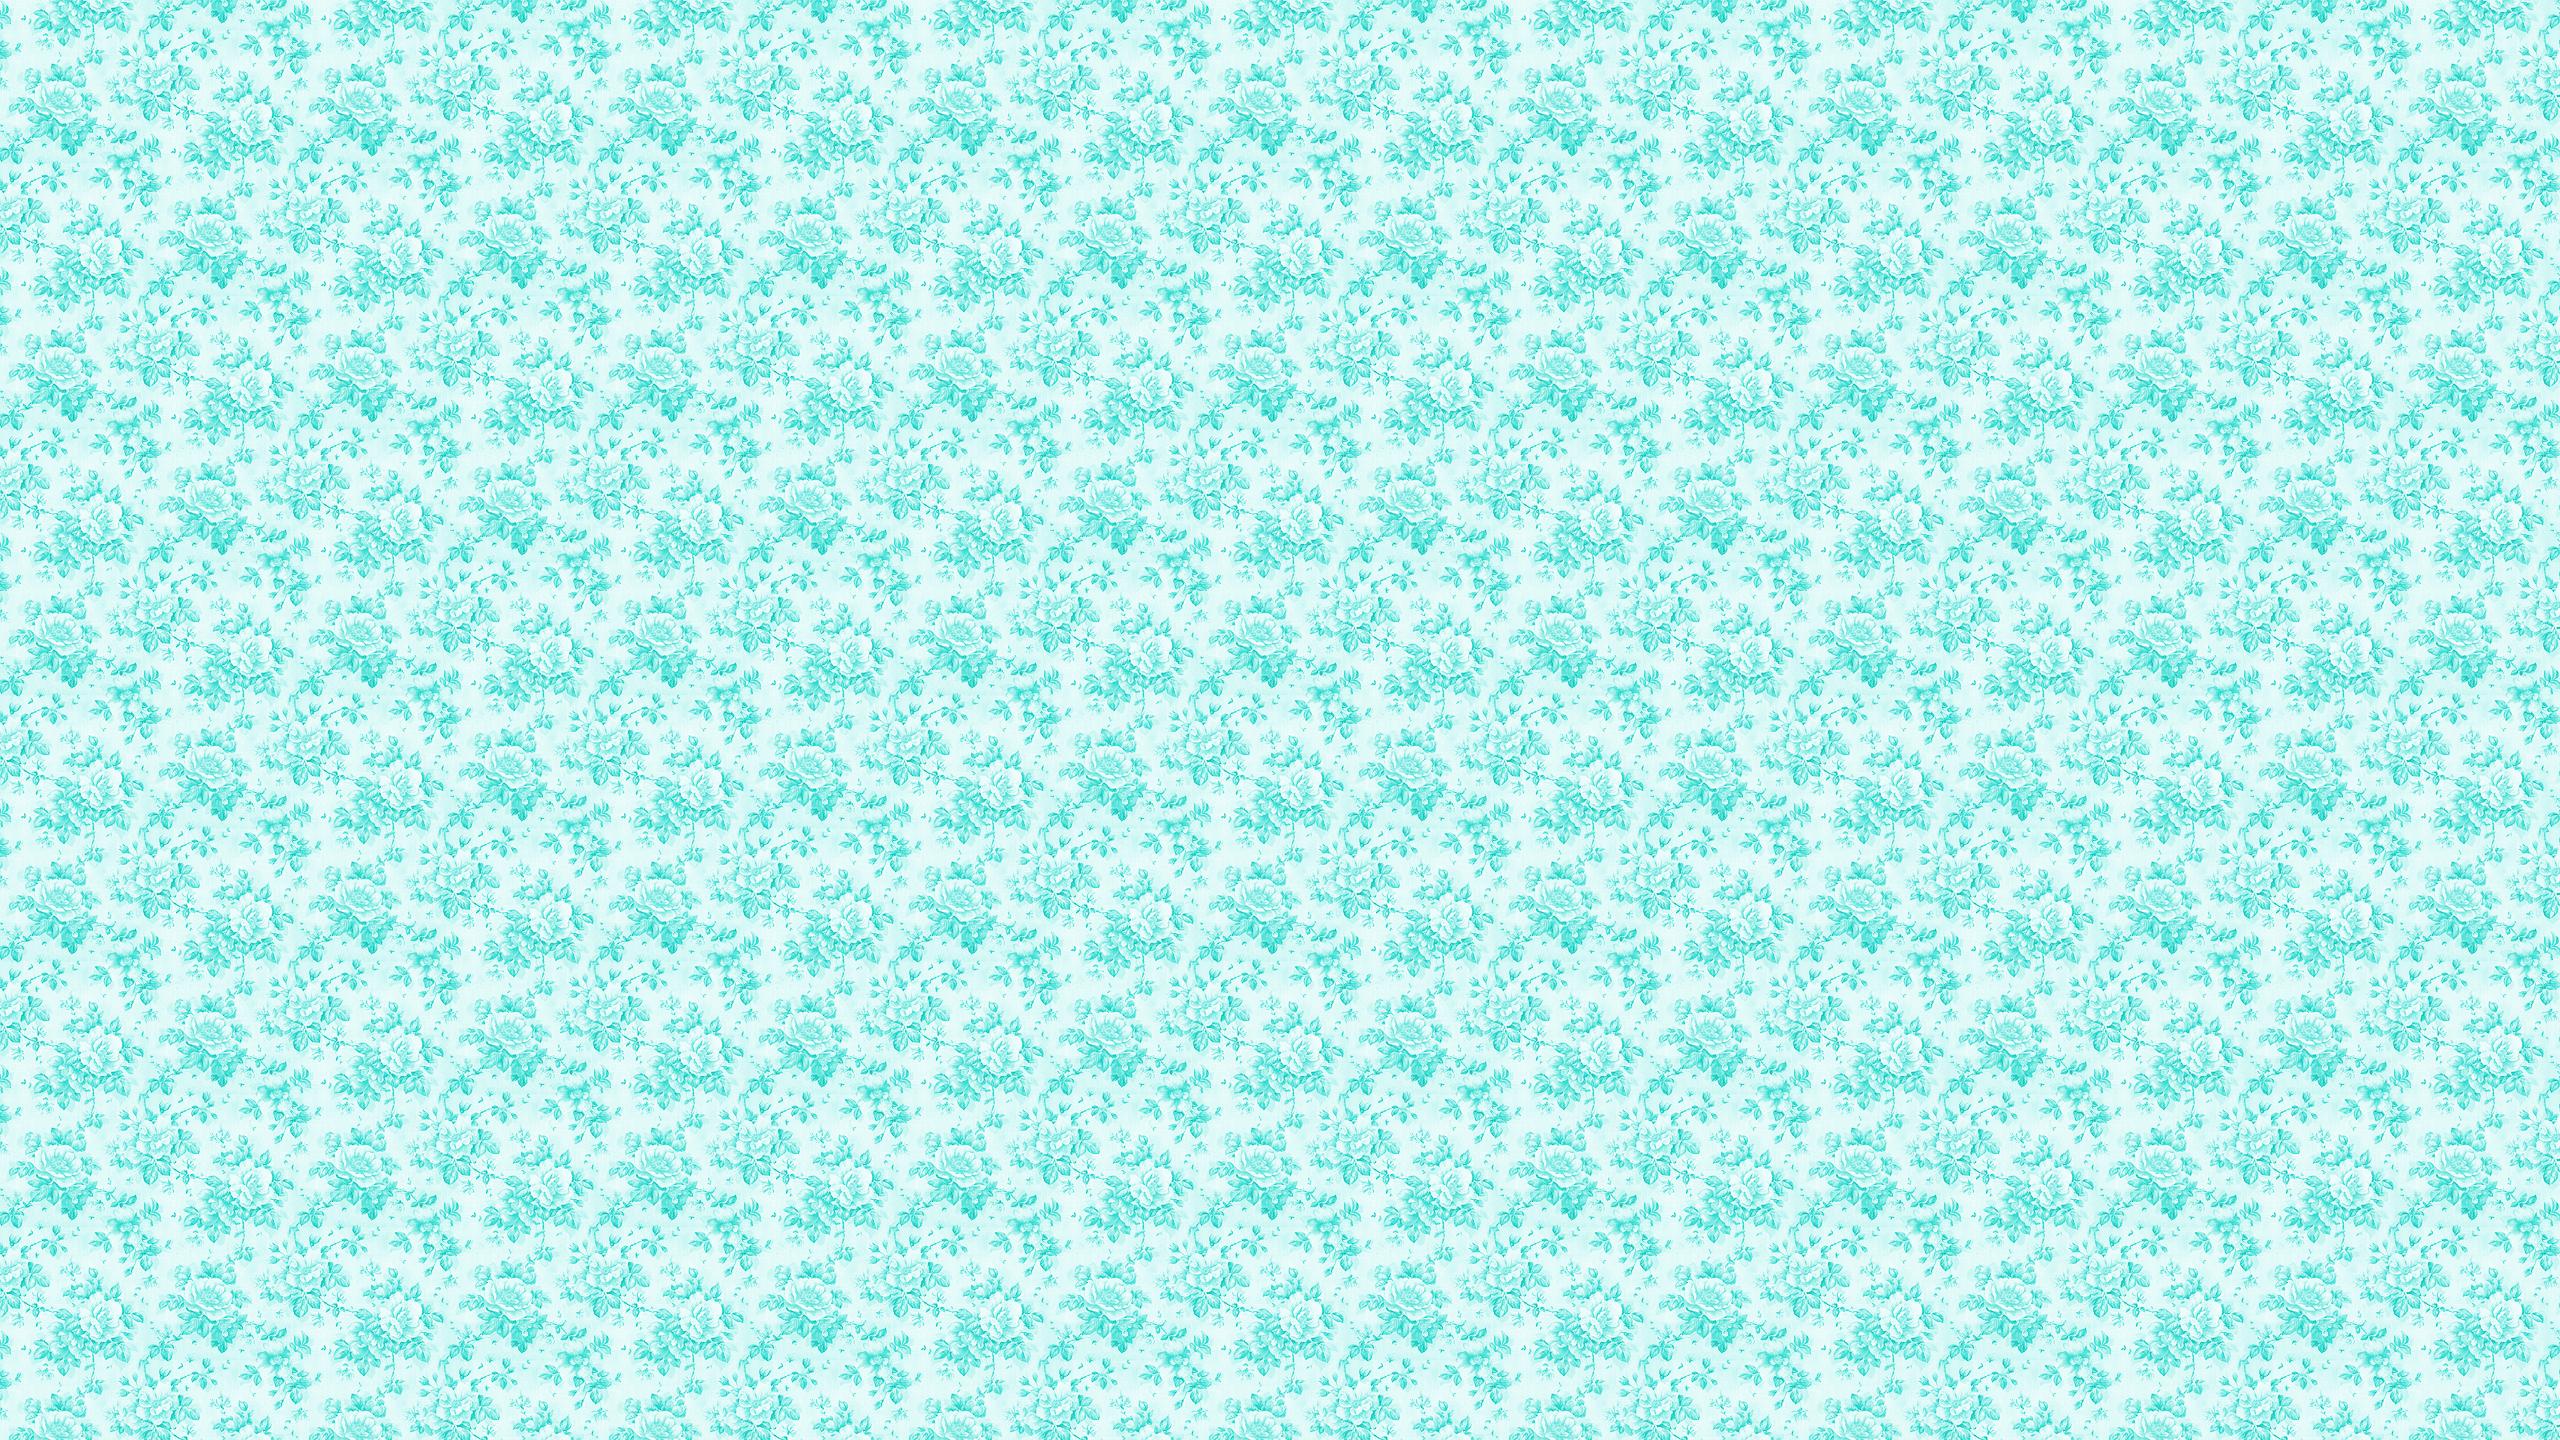 Tumblr Ombre Wallpapers Wallpaper Cave